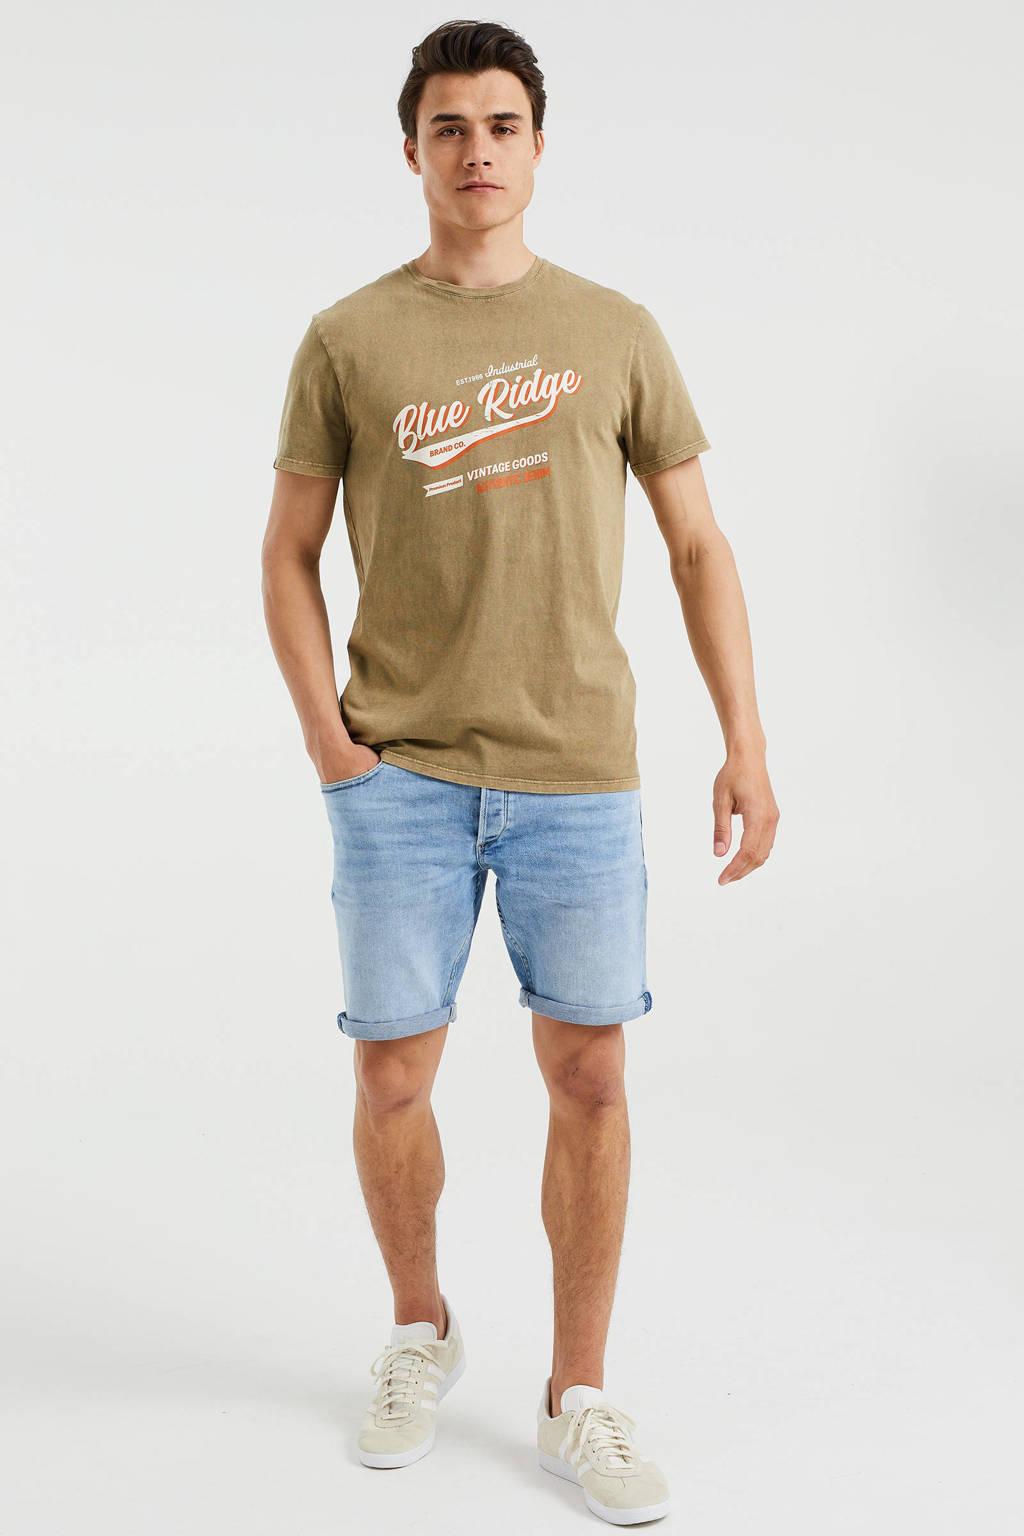 WE Fashion Blue Ridge slim fit T-shirt met printopdruk Forest Night, Forest night